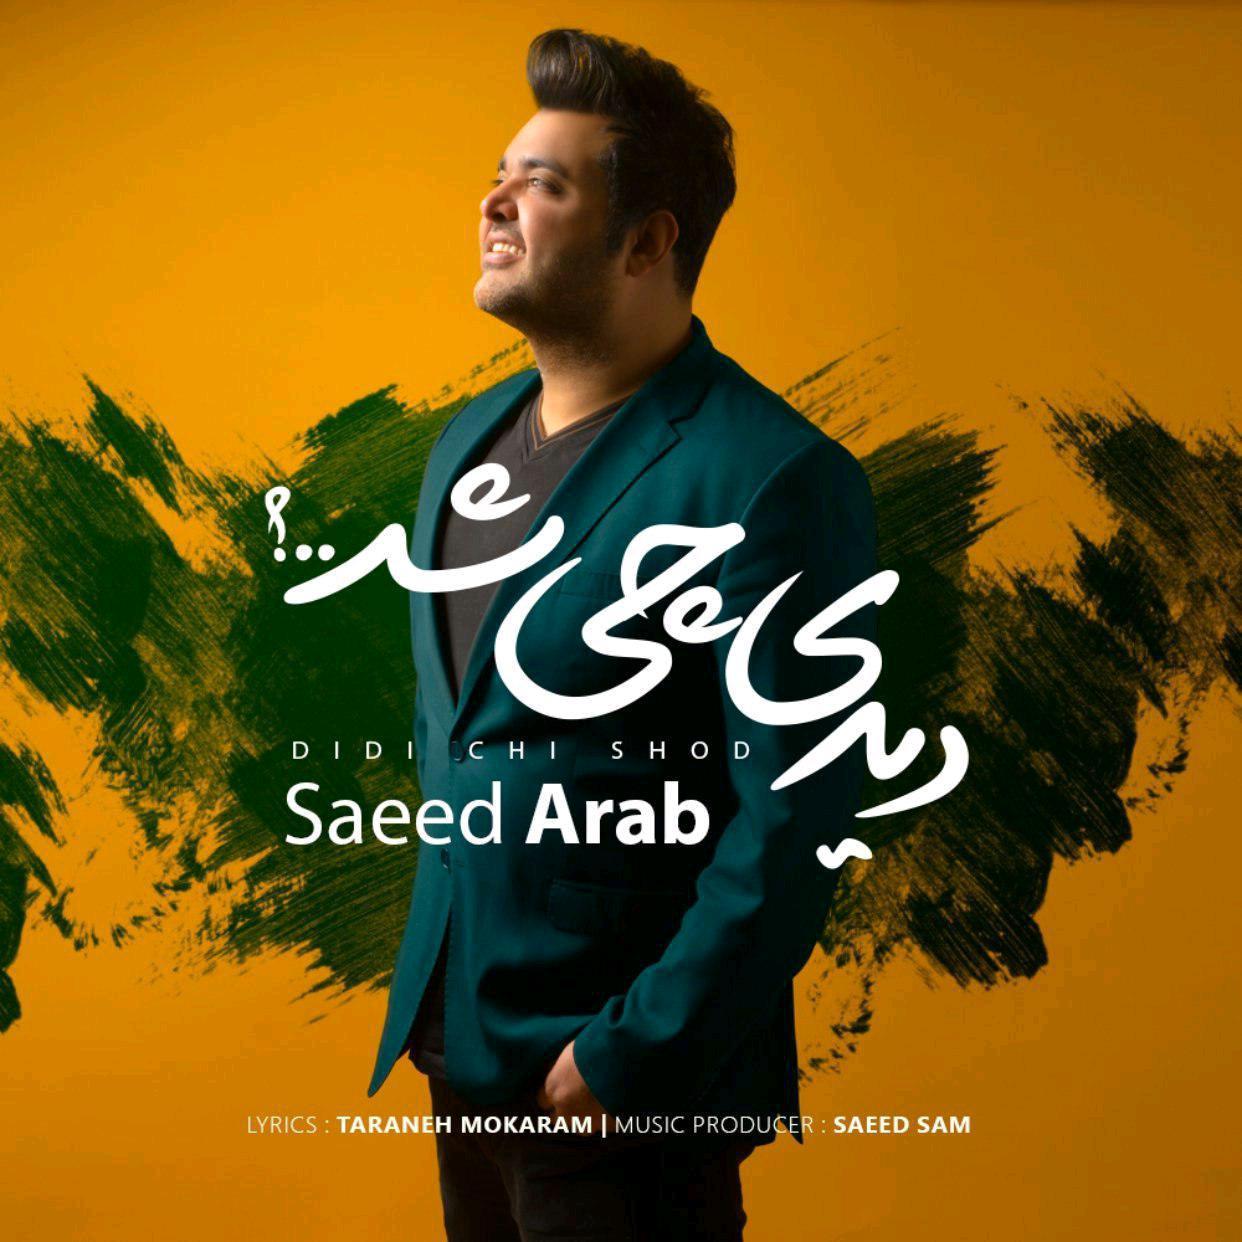 Saeed Arab – Didi Chi Shod